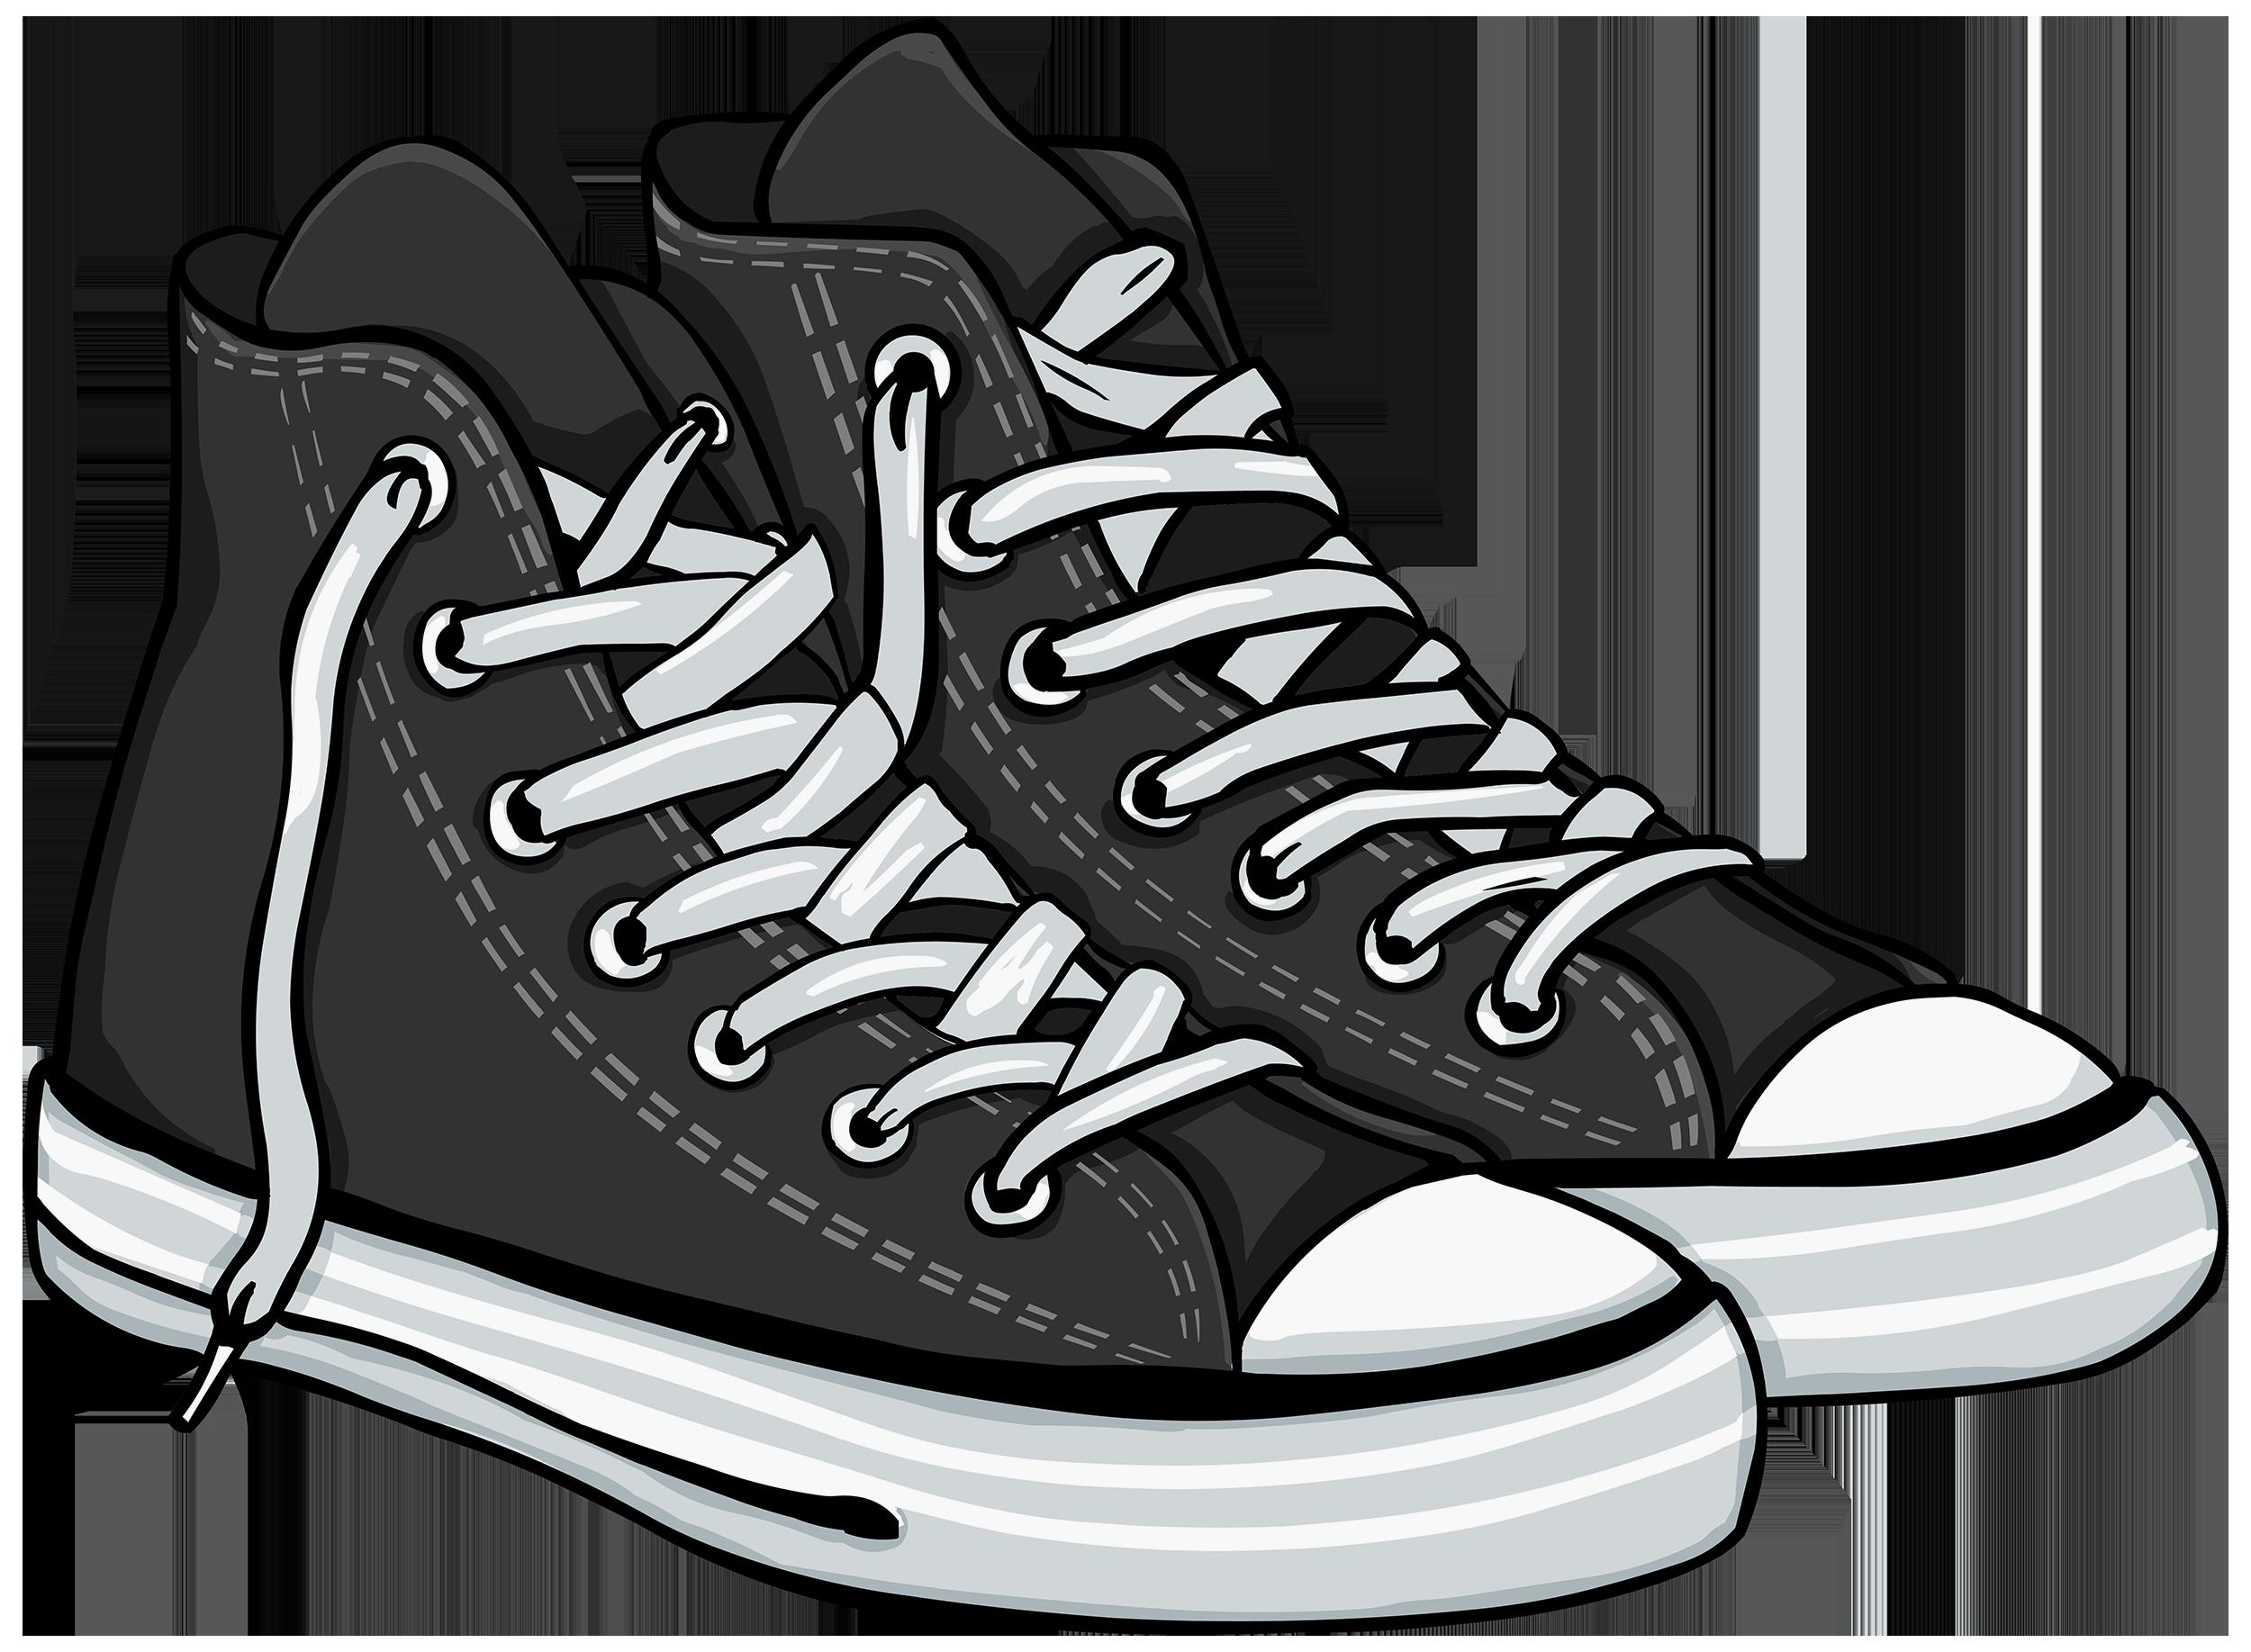 Download PNG image - Sneaker File 343